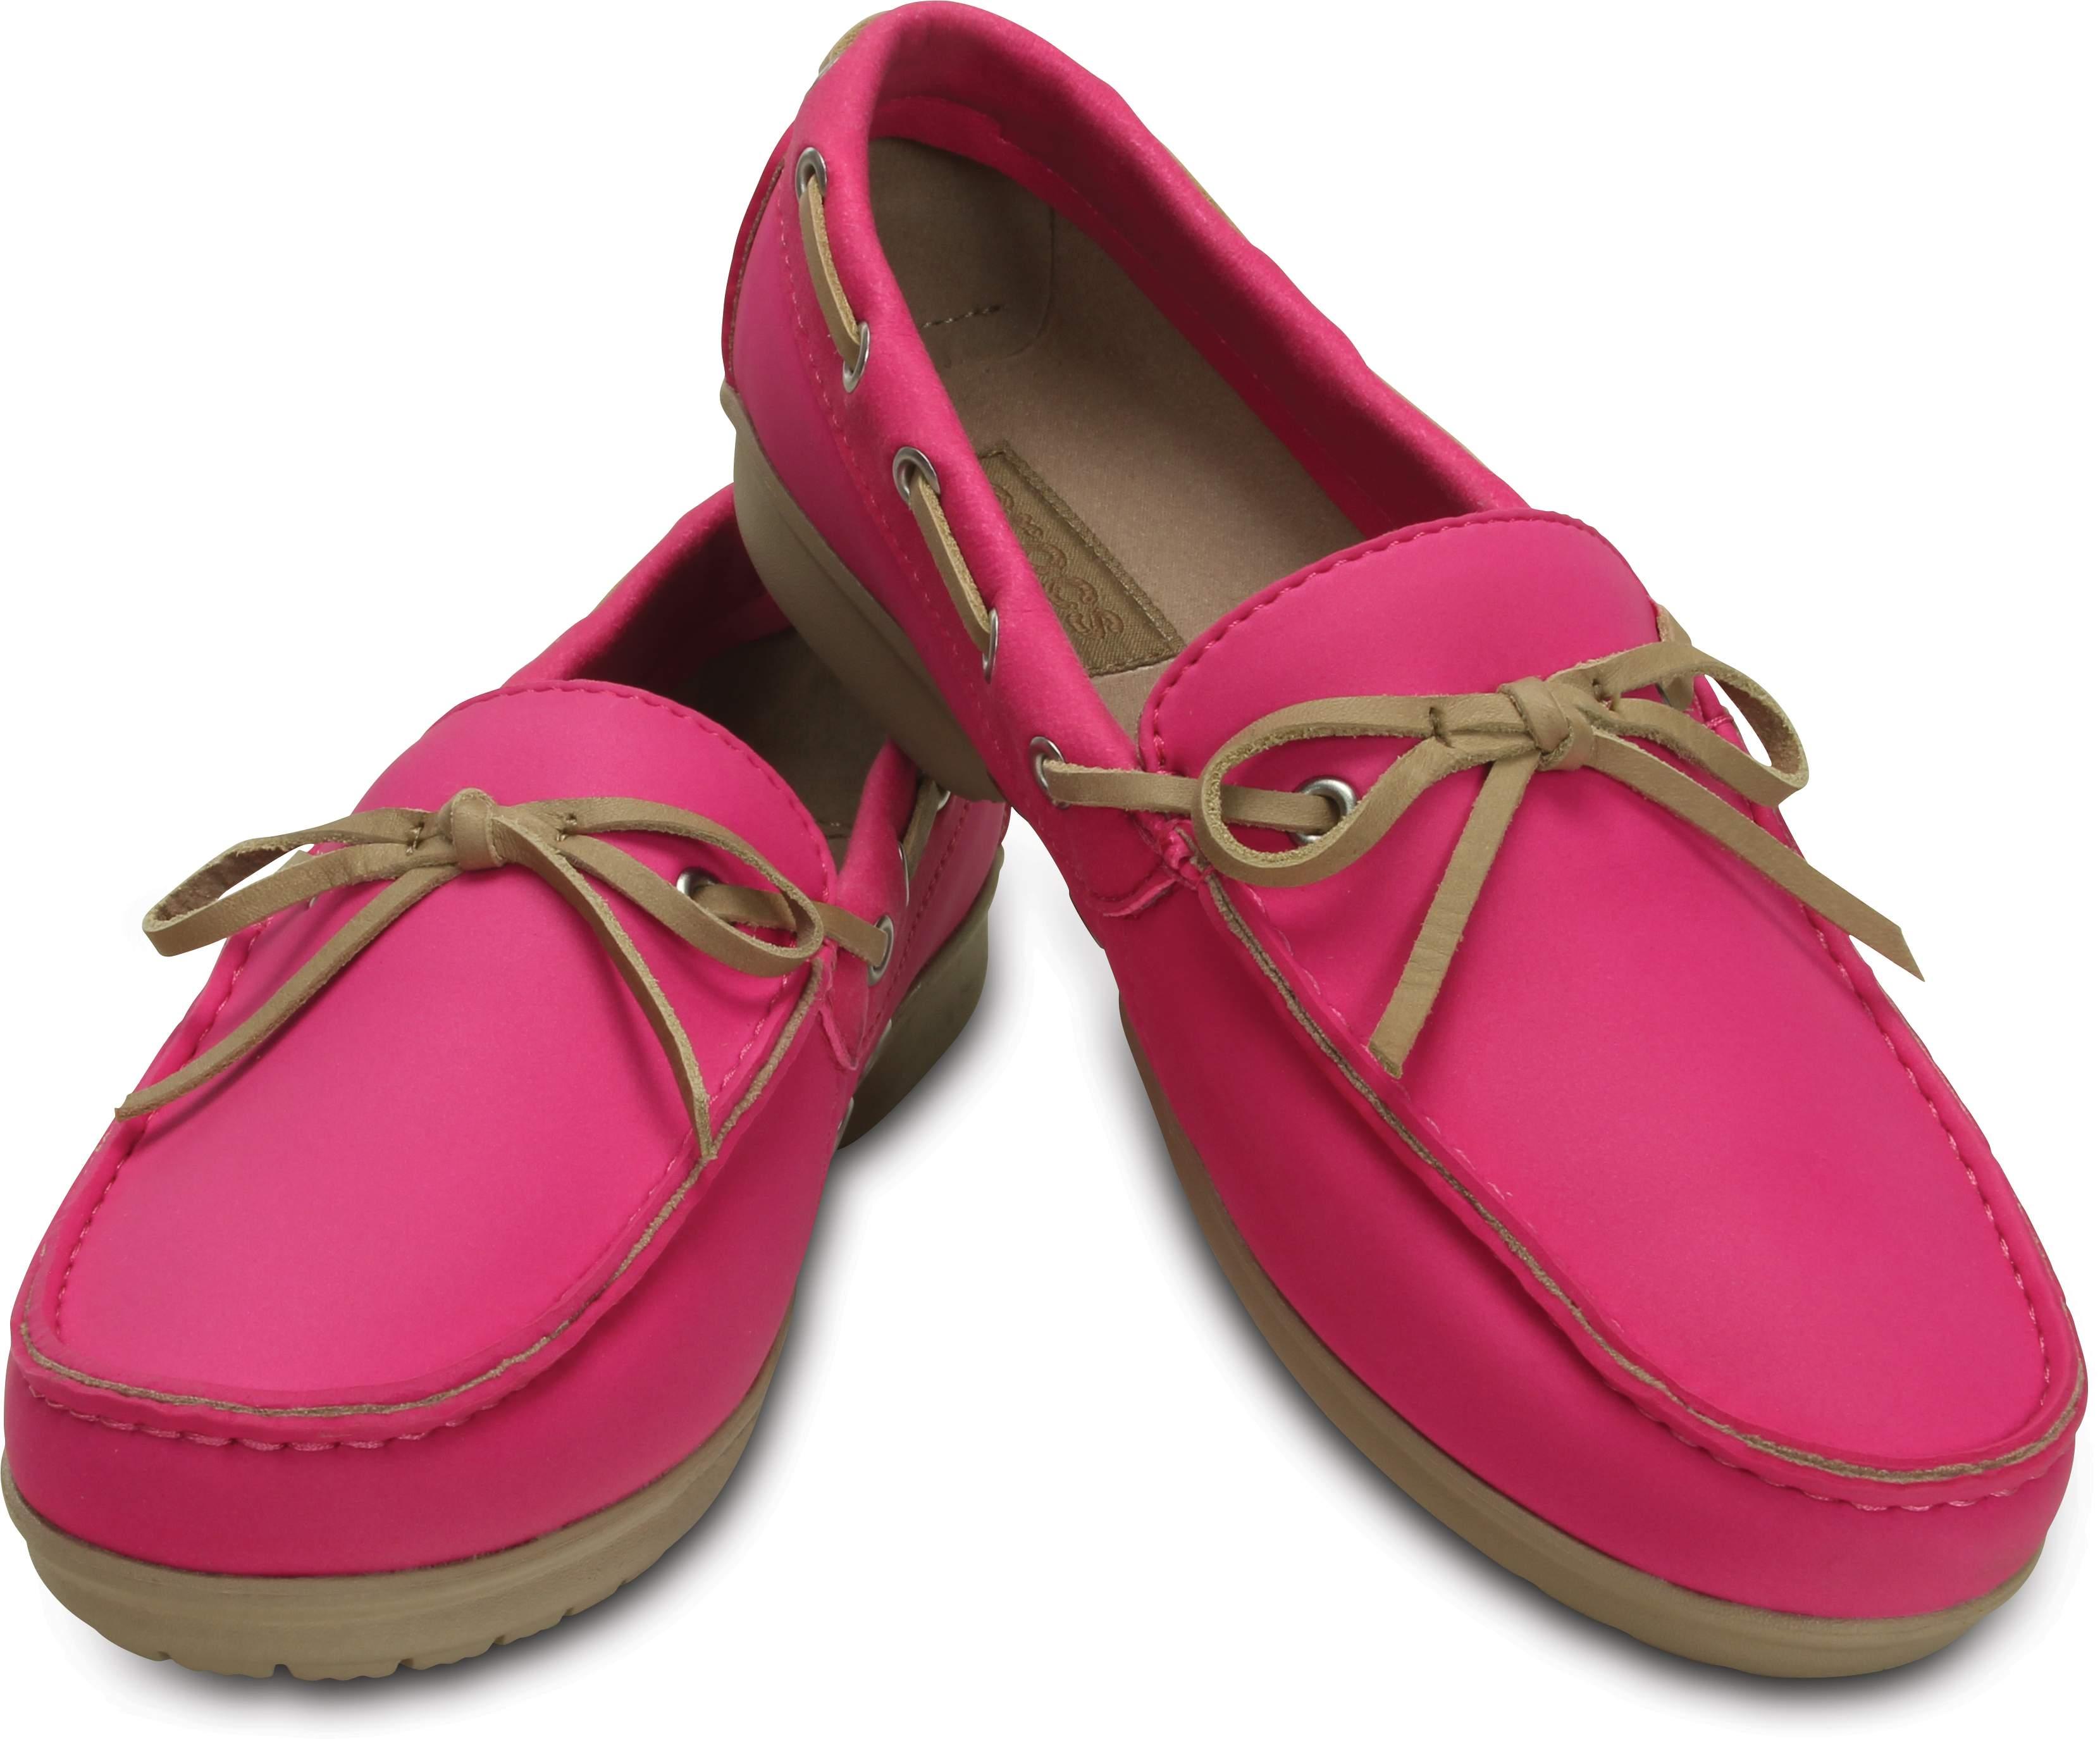 Crocs Women's Wrap ColorLite Loafer Pink 15753-6IR